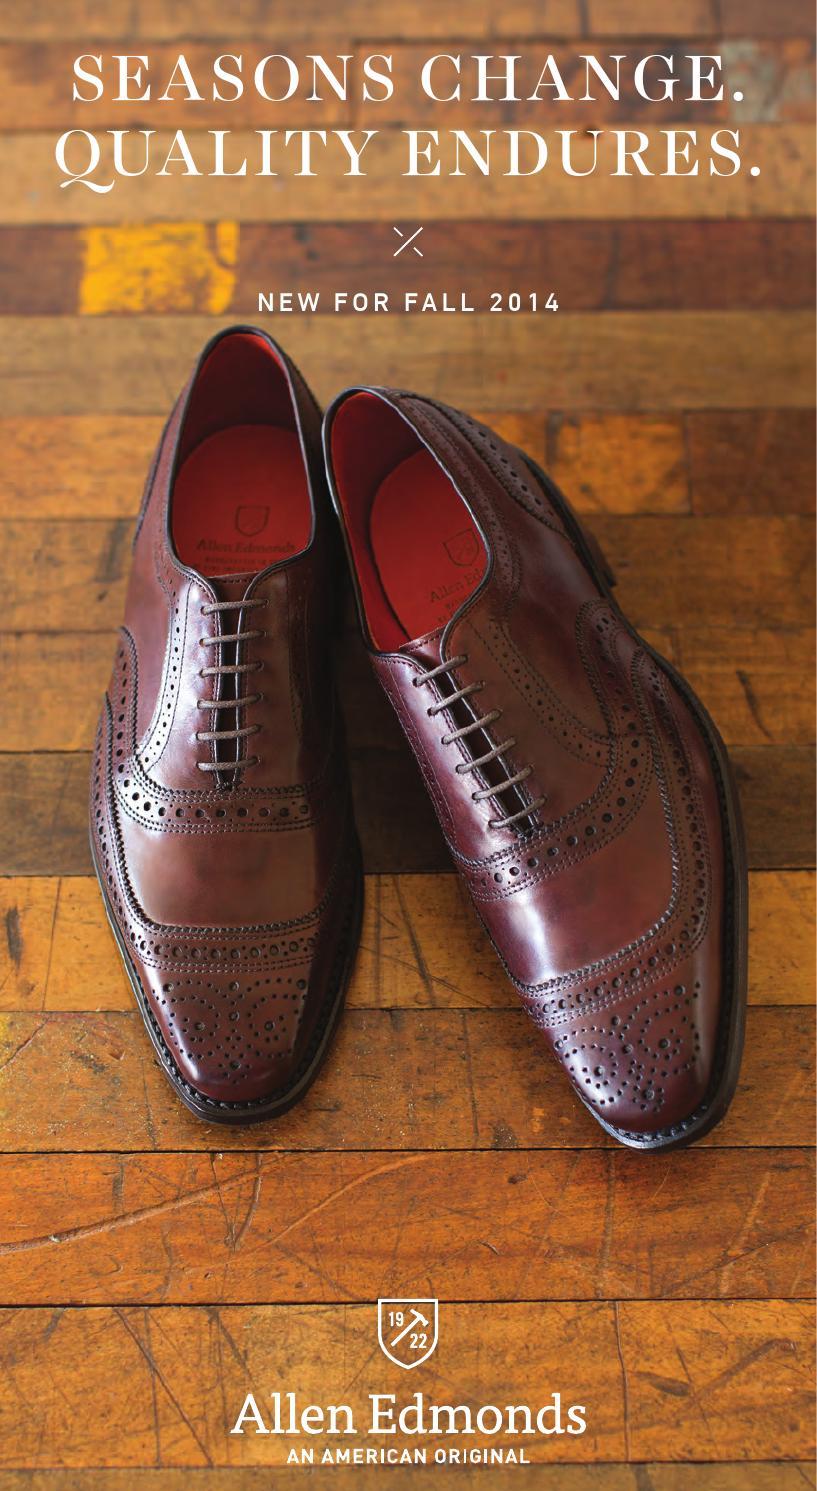 2014 allen edmonds fall catalog by allen edmonds shoe corporation